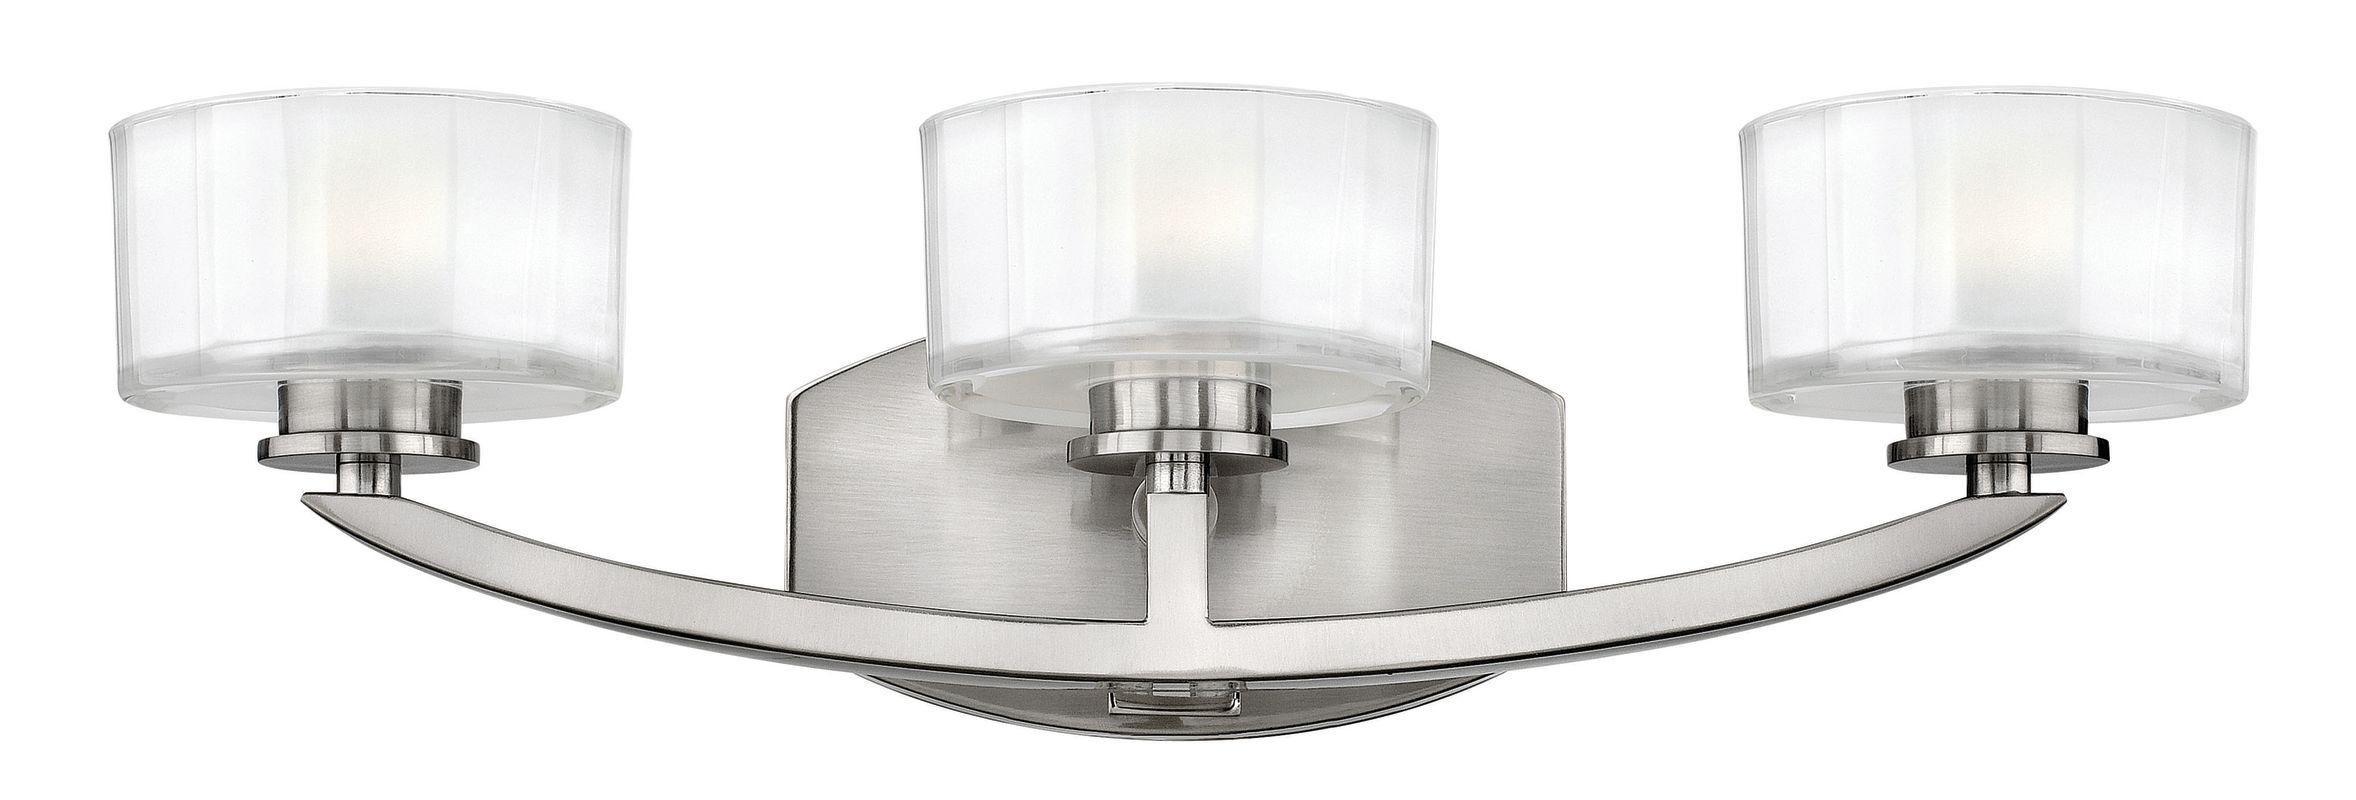 Hinkley 5593BN Brushed Nickel Contemporary Meridian Bathroom Light